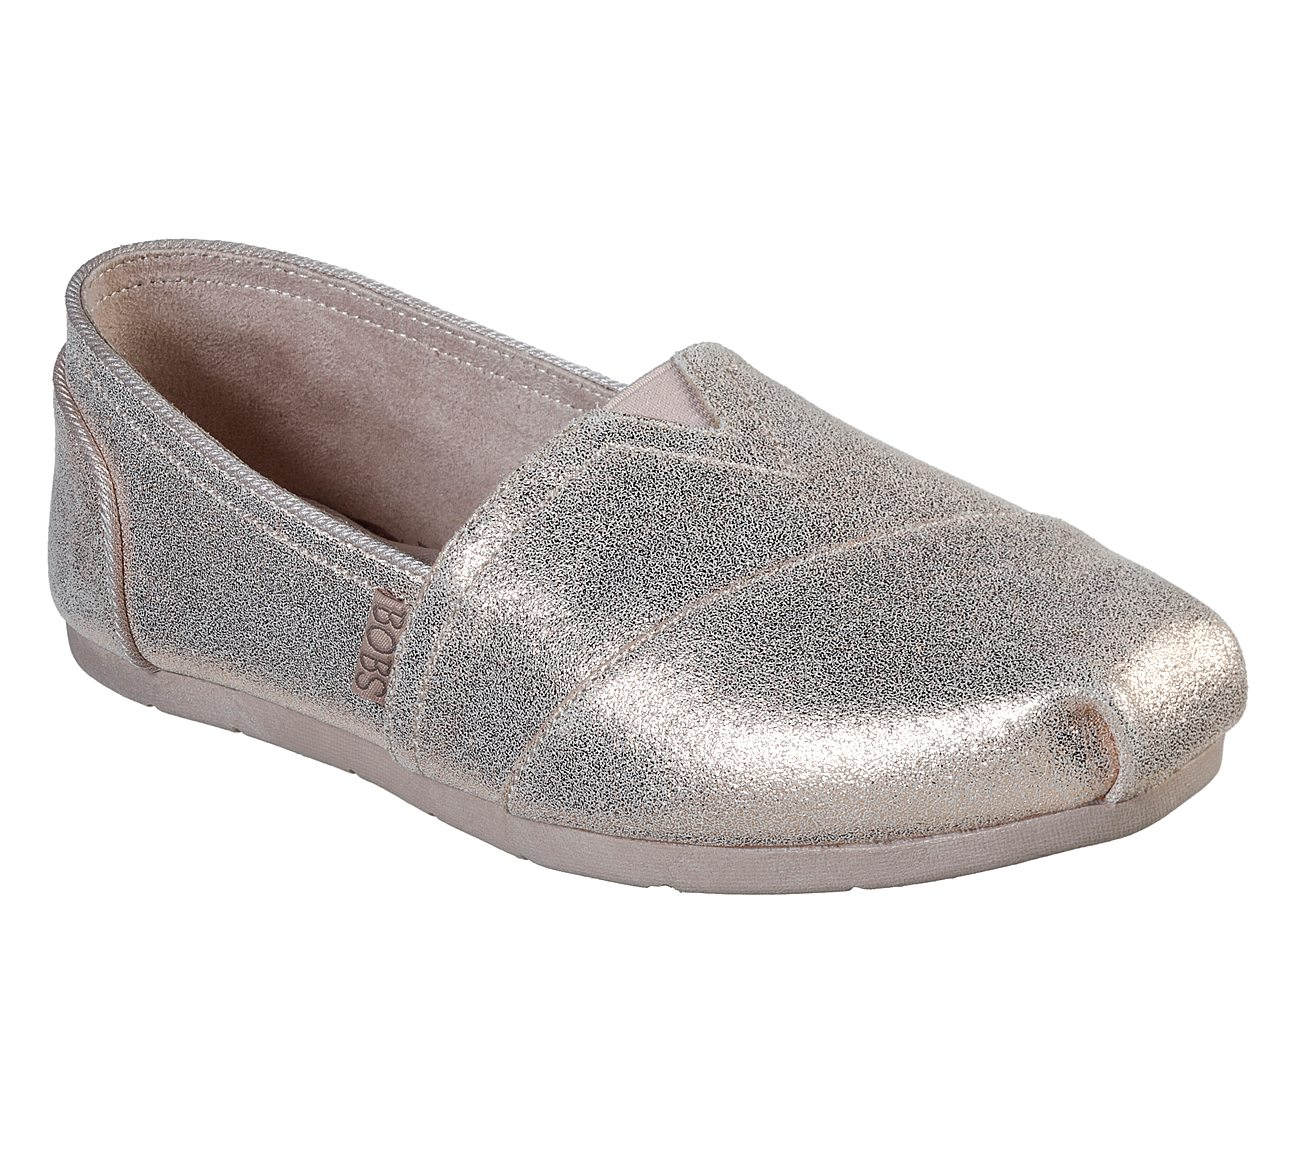 Emoción cliente Luminancia  Buy SKECHERS Luxe BOBS - Pretty Pretty SKECHERS Bobs Shoes